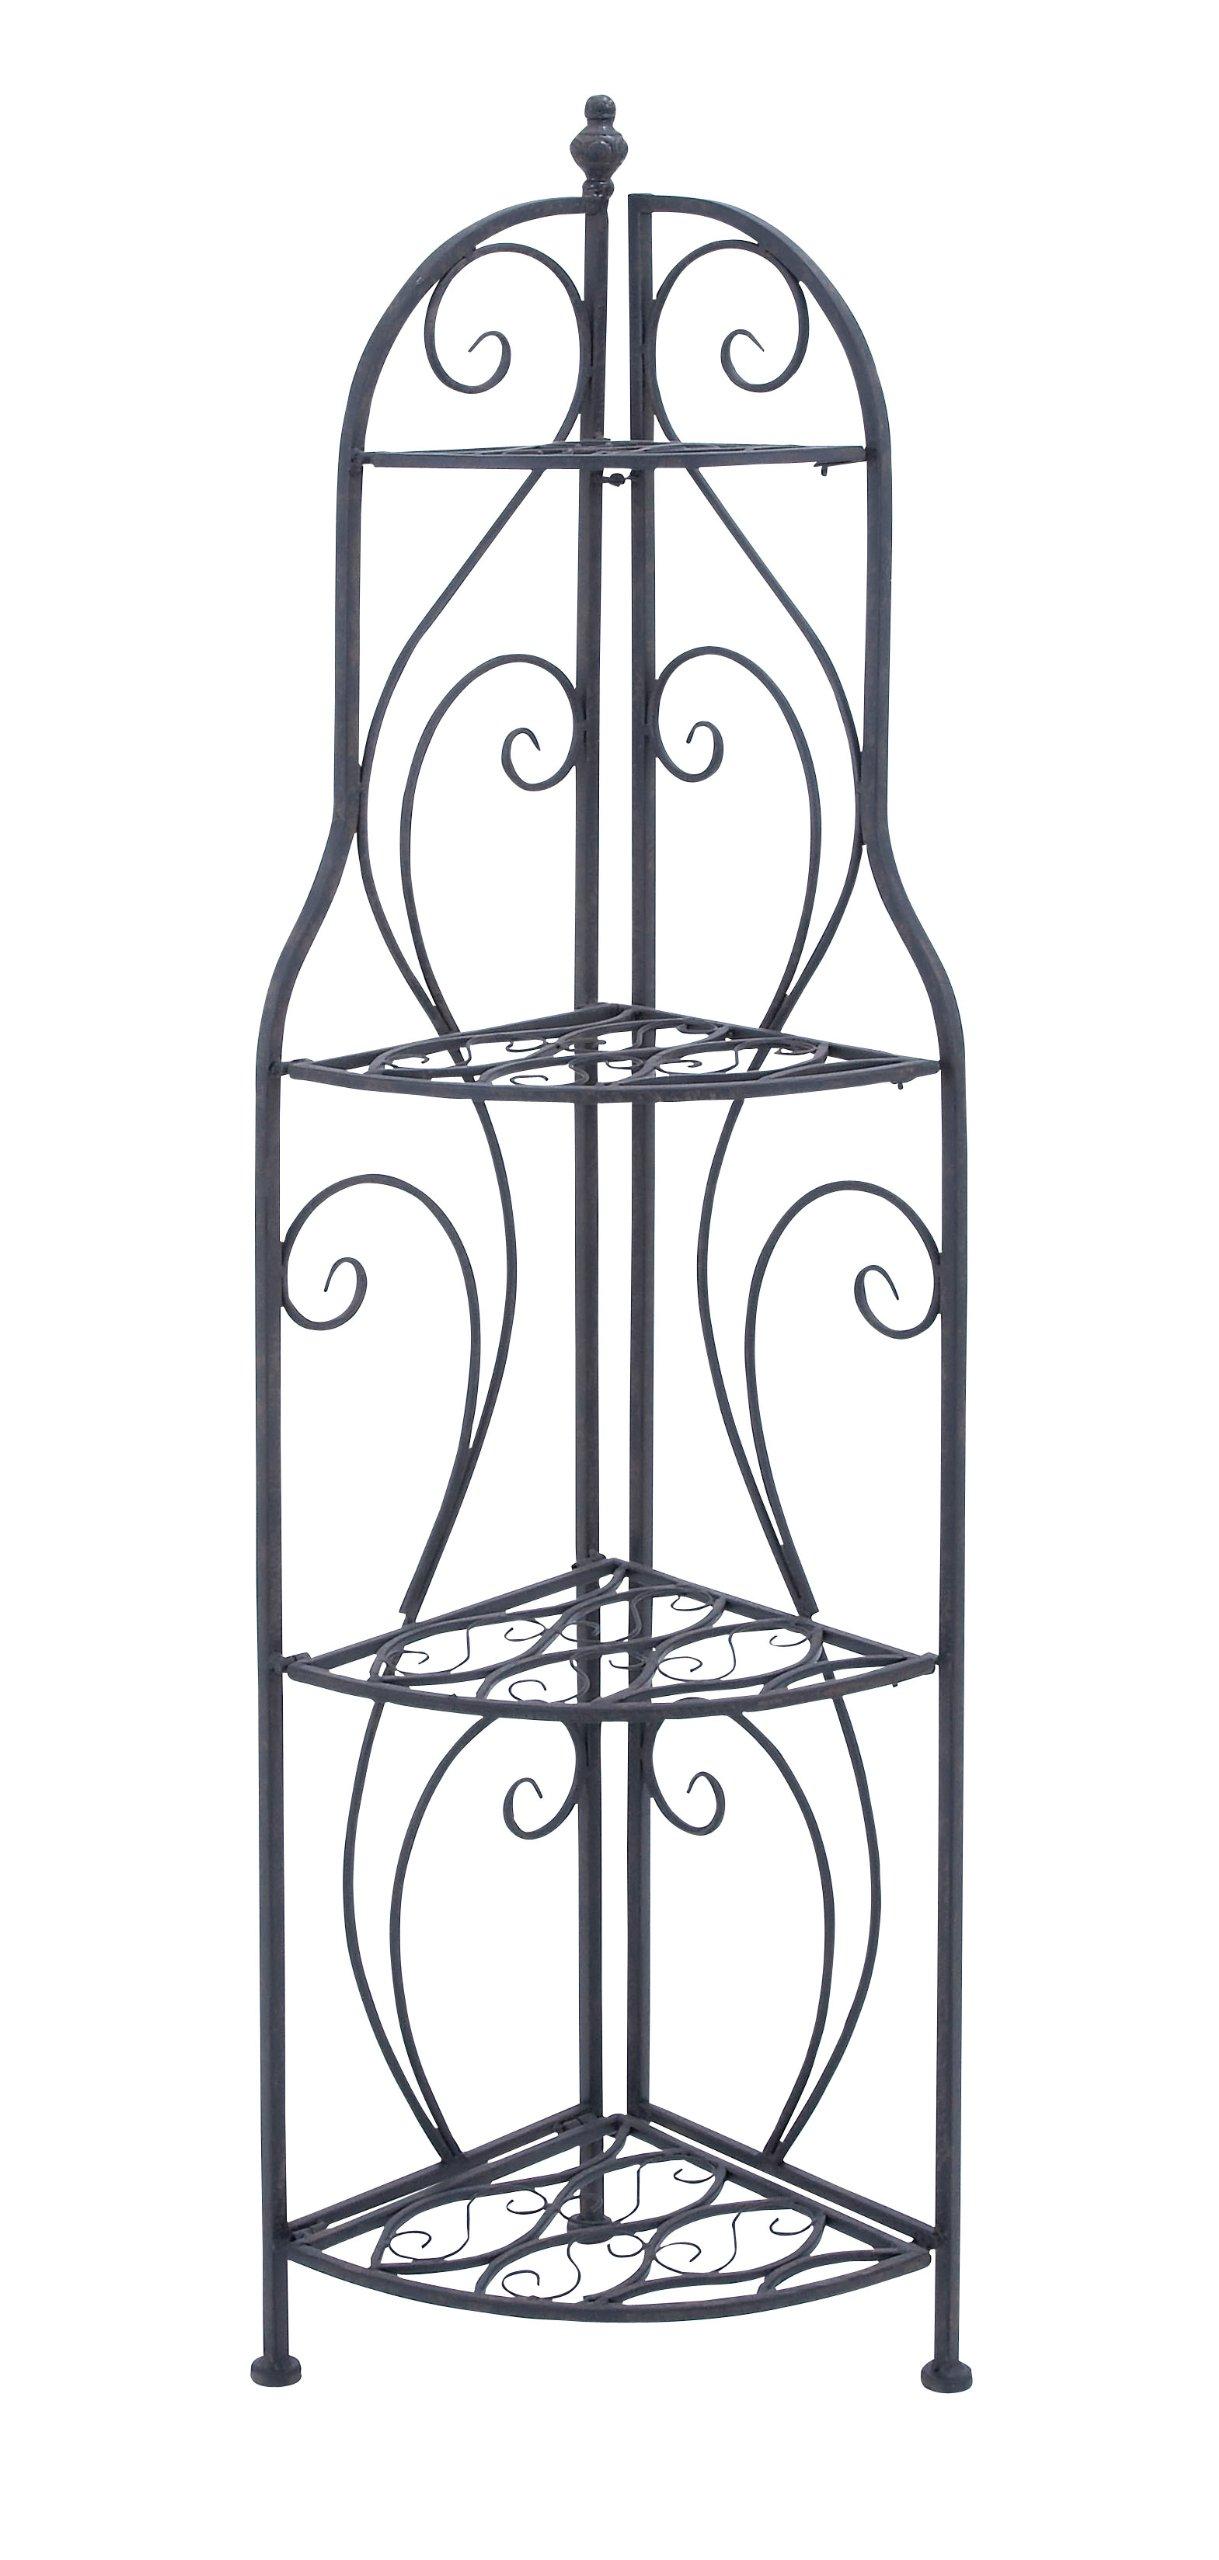 Deco 79 Metal Corner Rack, 60-Inch by 17-Inch